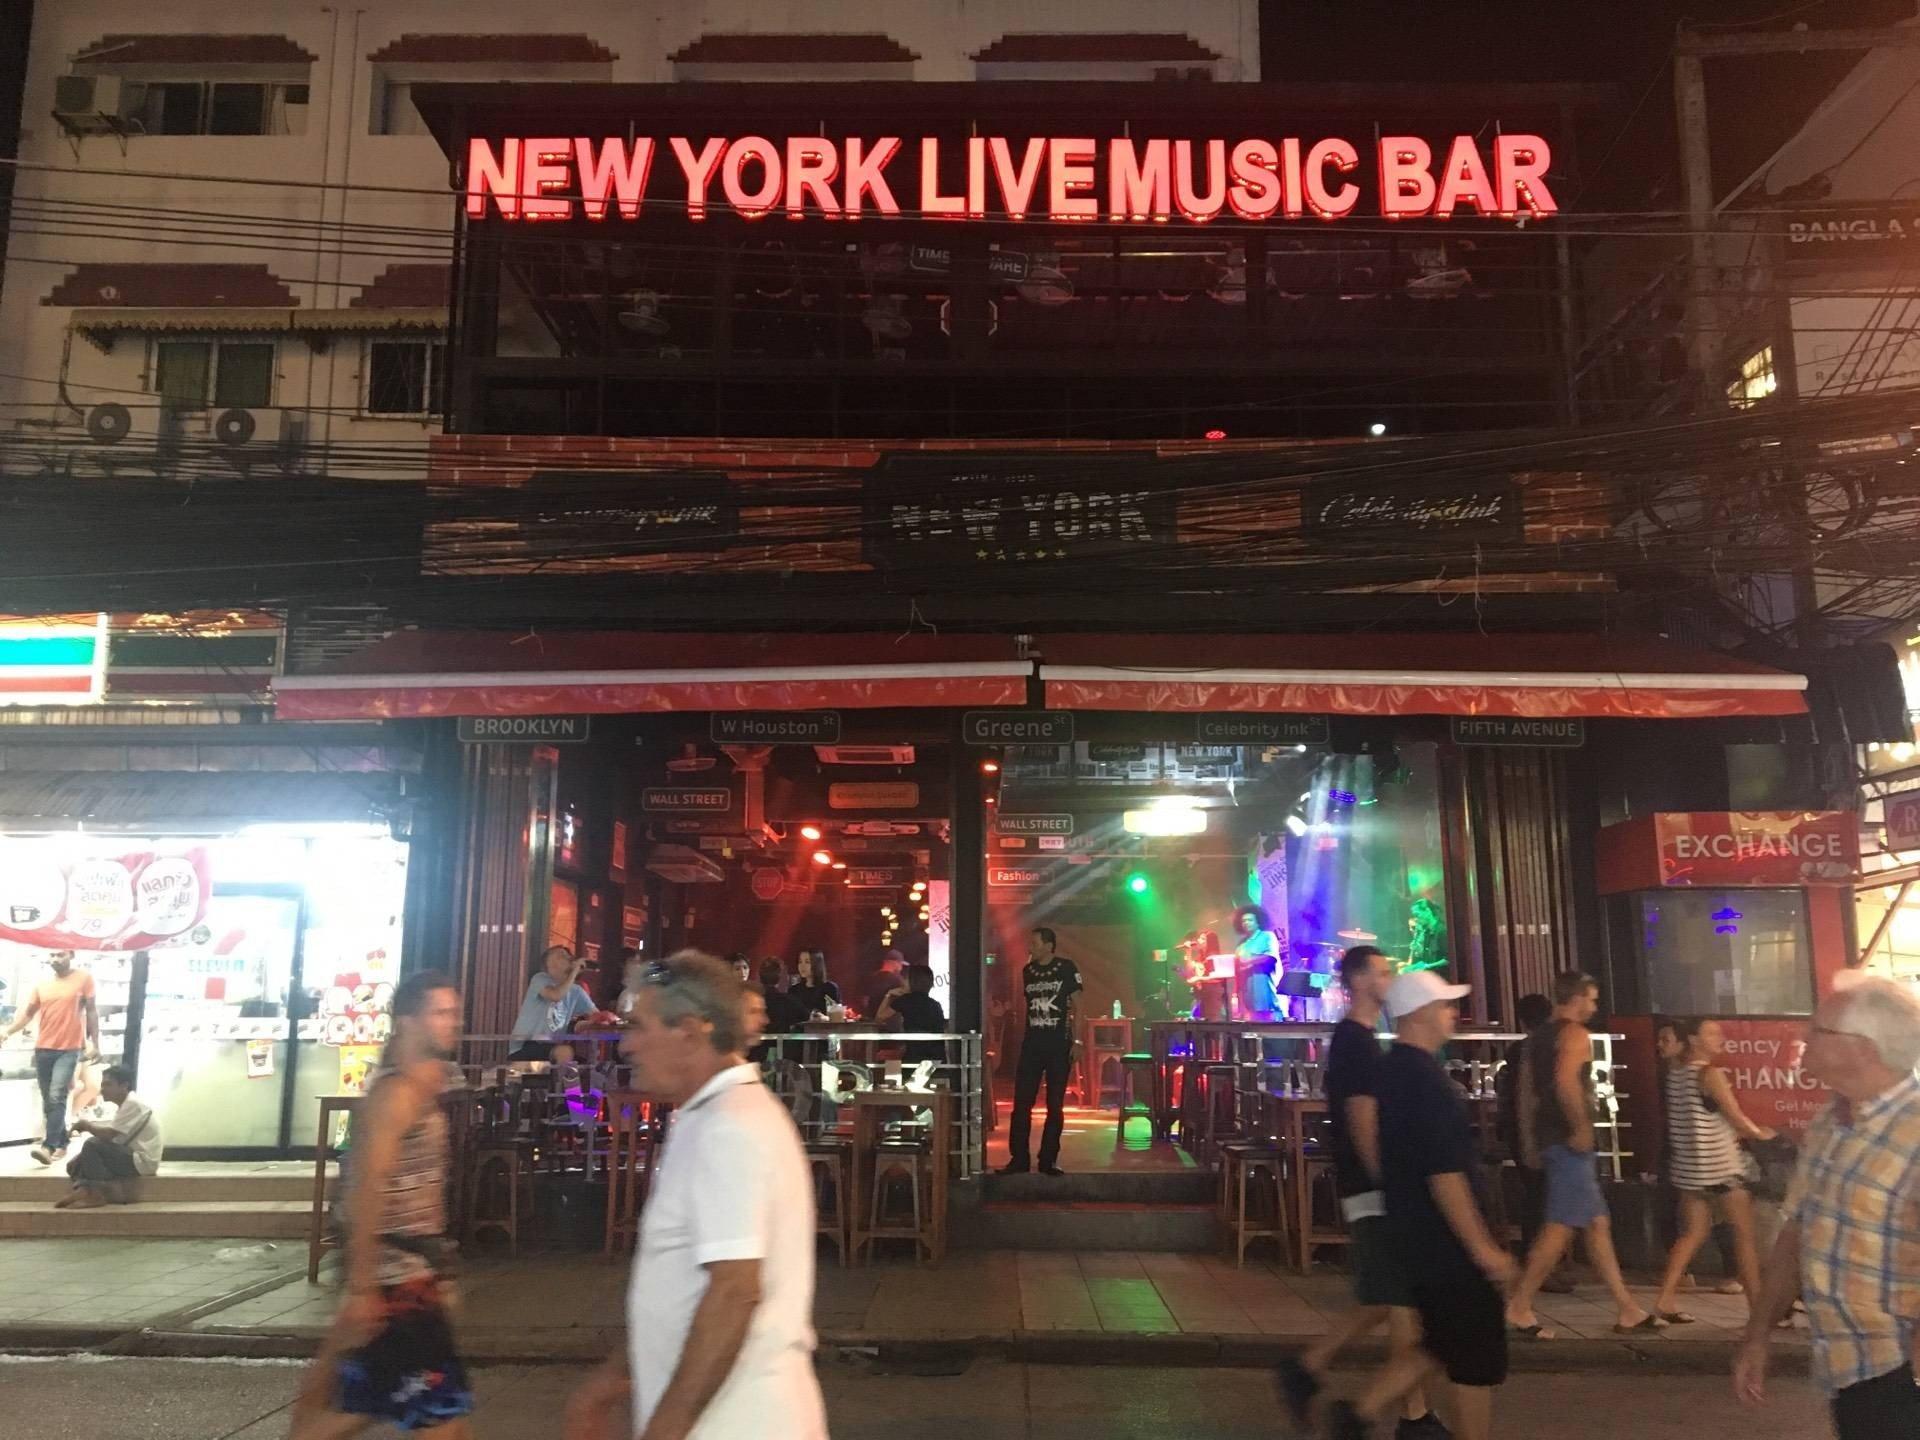 New York Live Music Bar